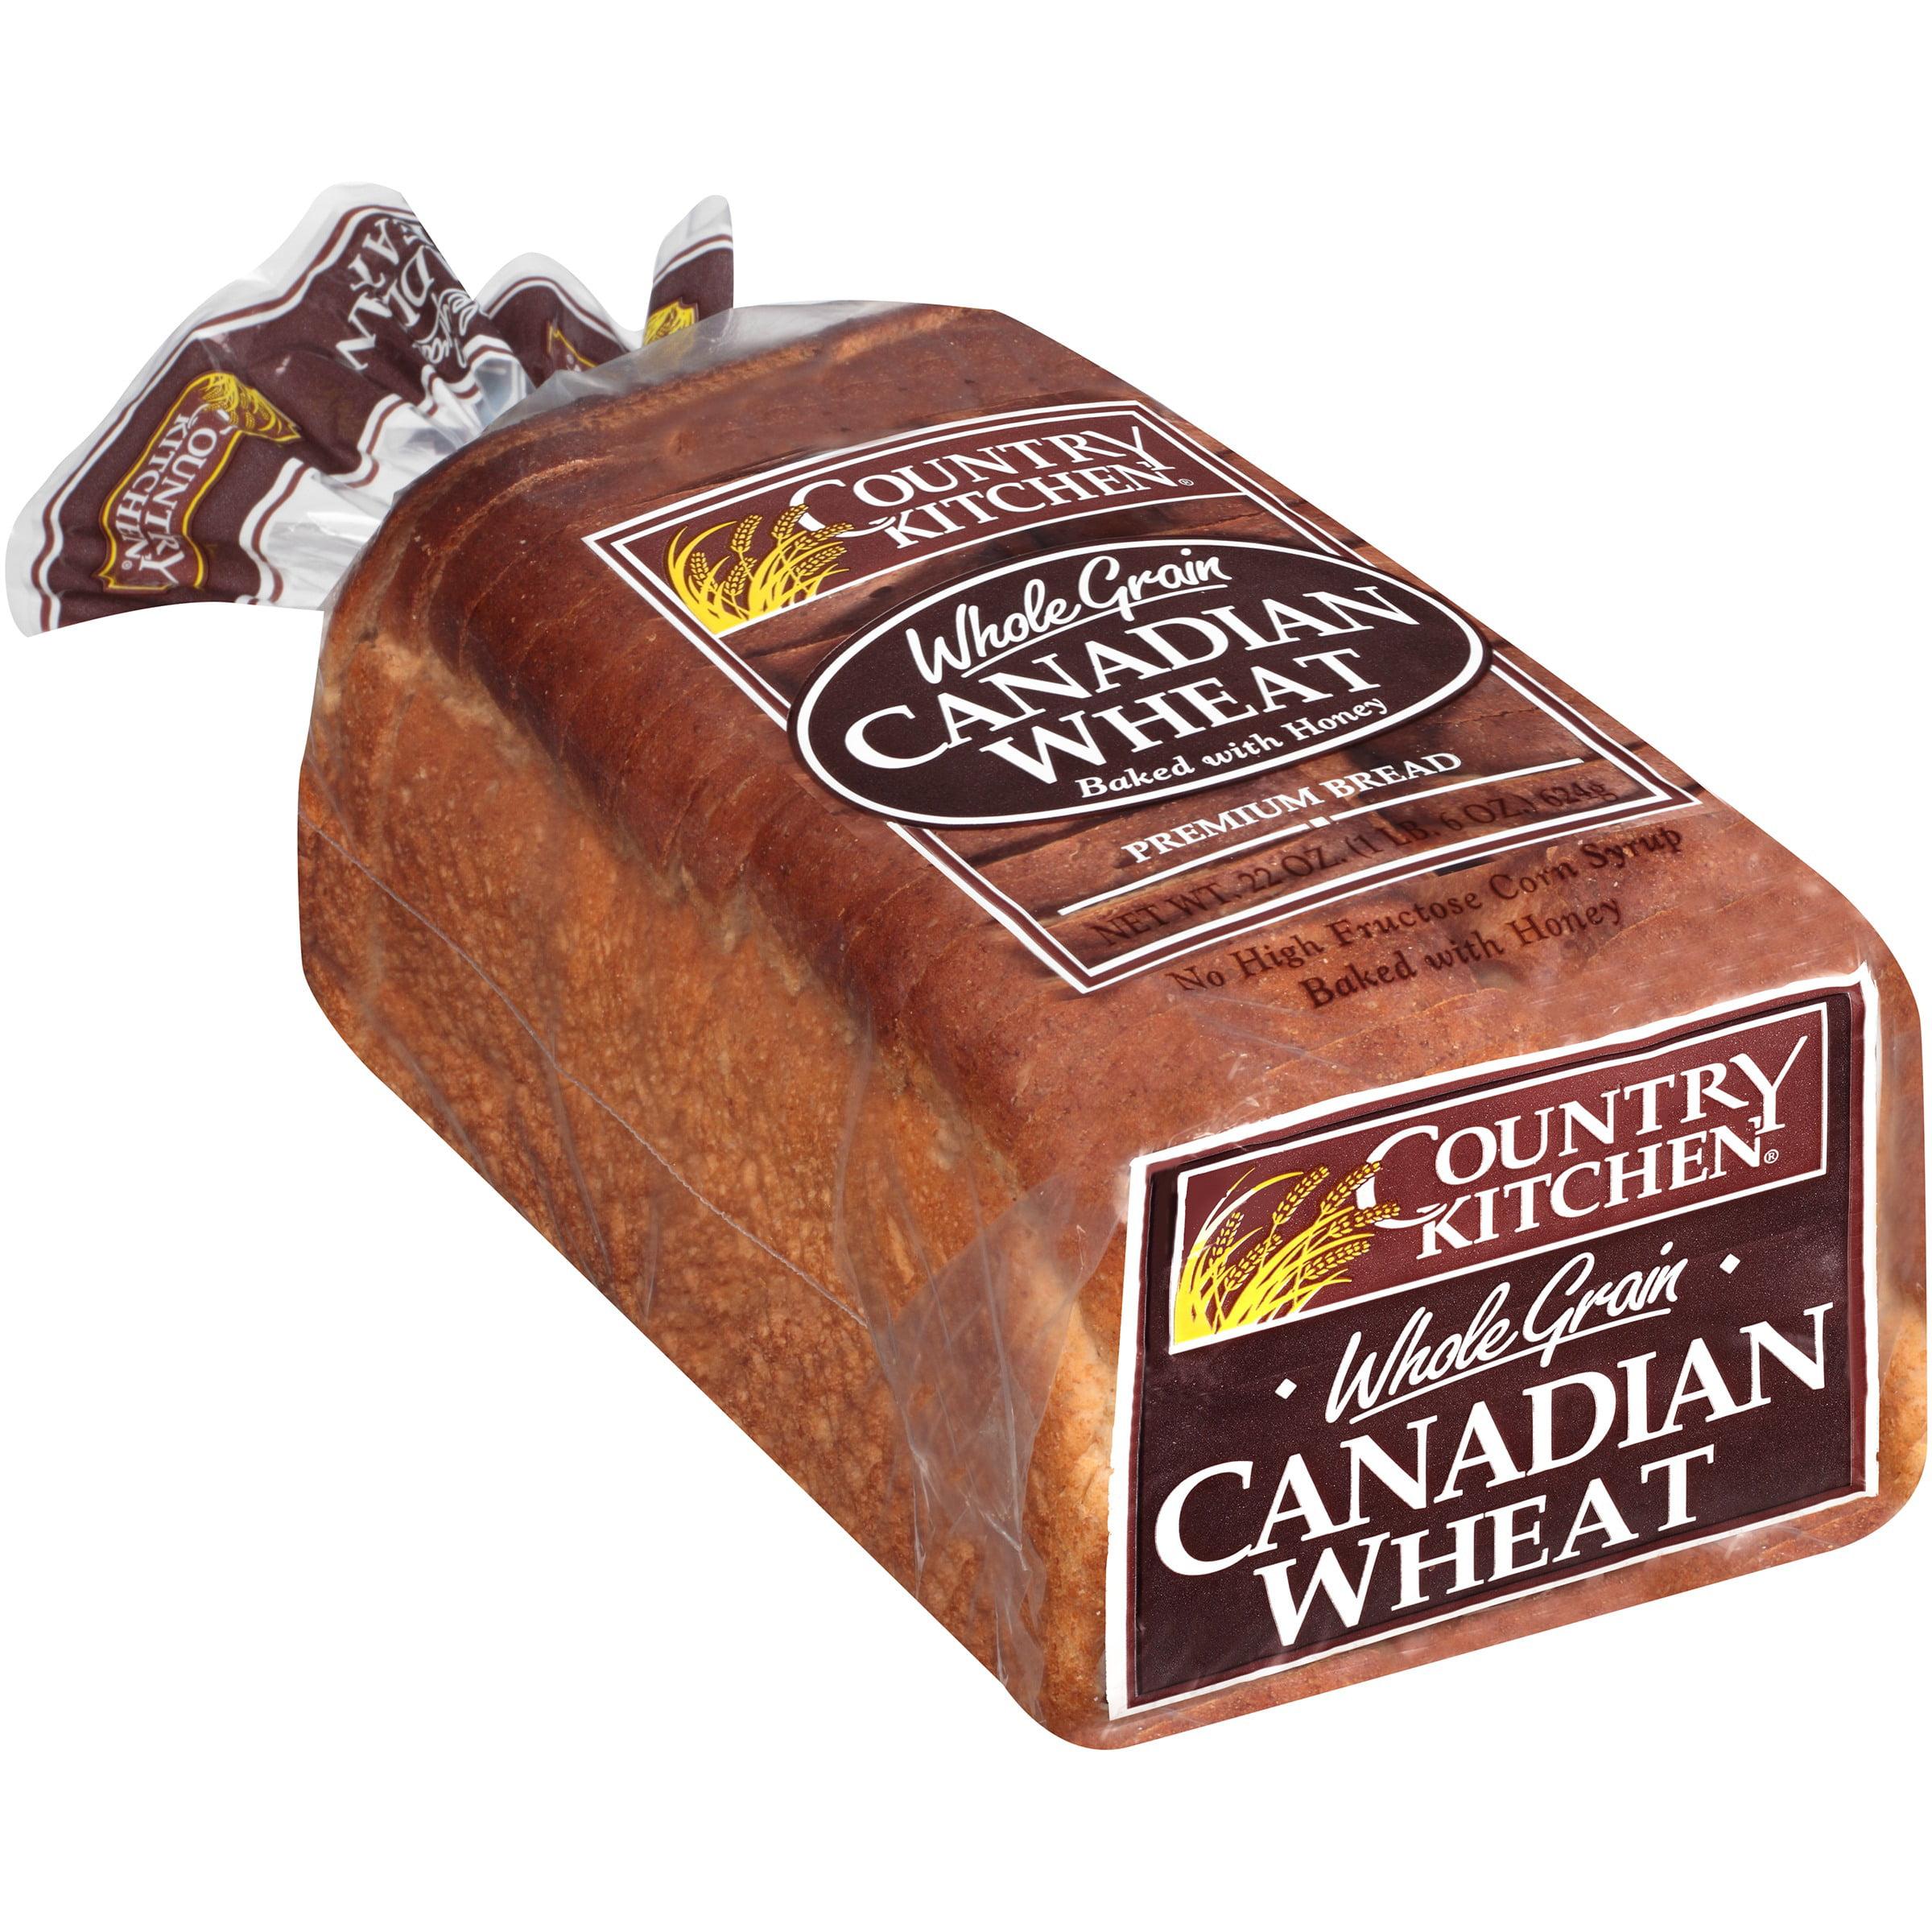 Country Kitchen Whole Grain Canadian Wheat Bread 22 Oz Bag Walmart Com